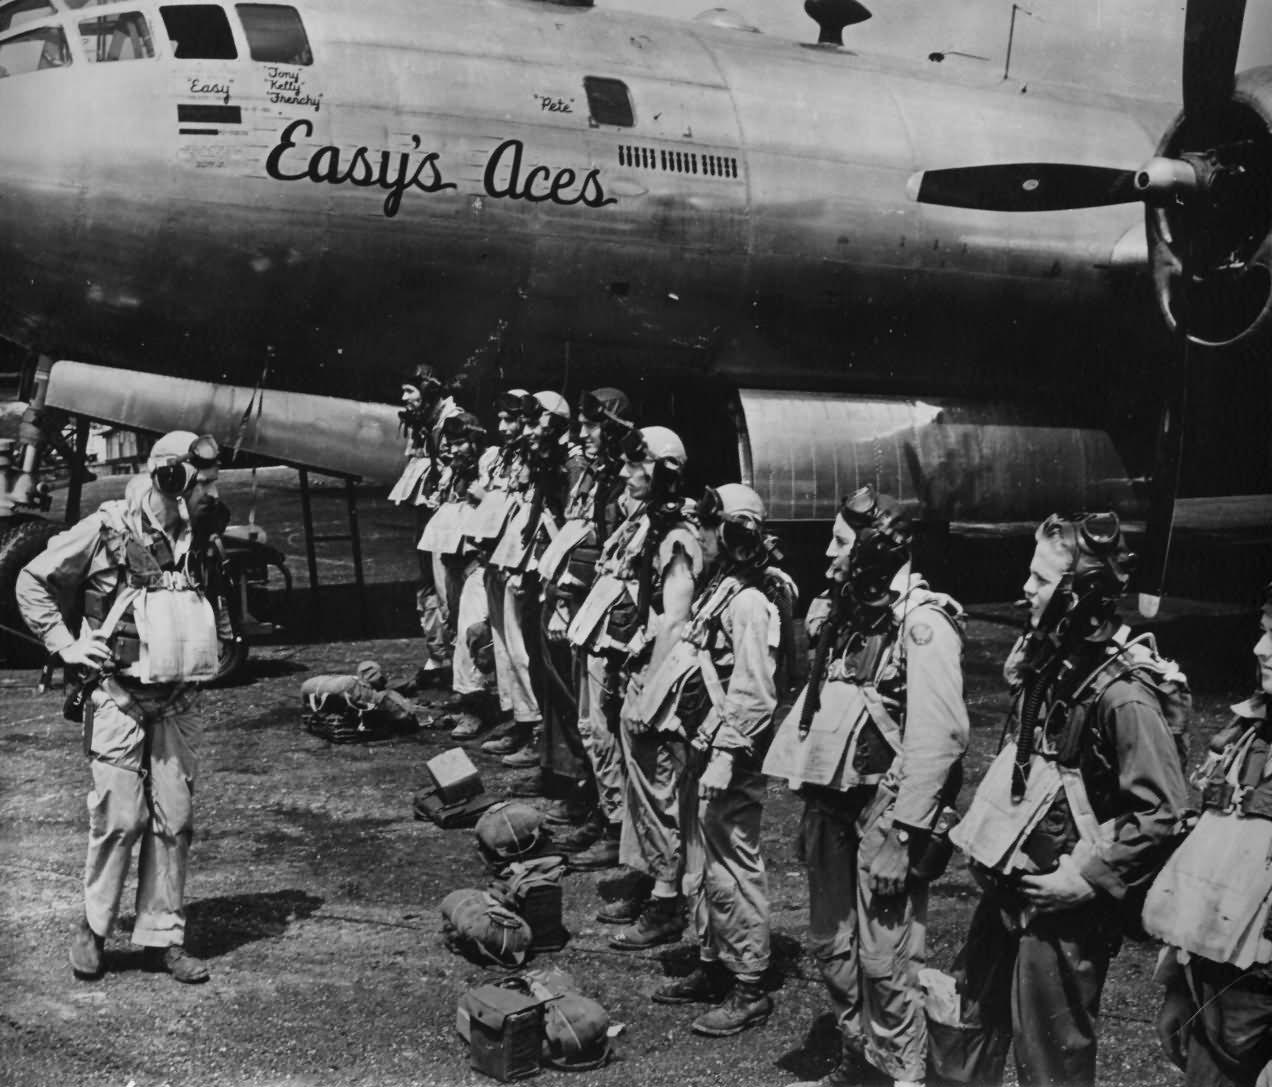 B-29 Superfortress Easy's Aces crew